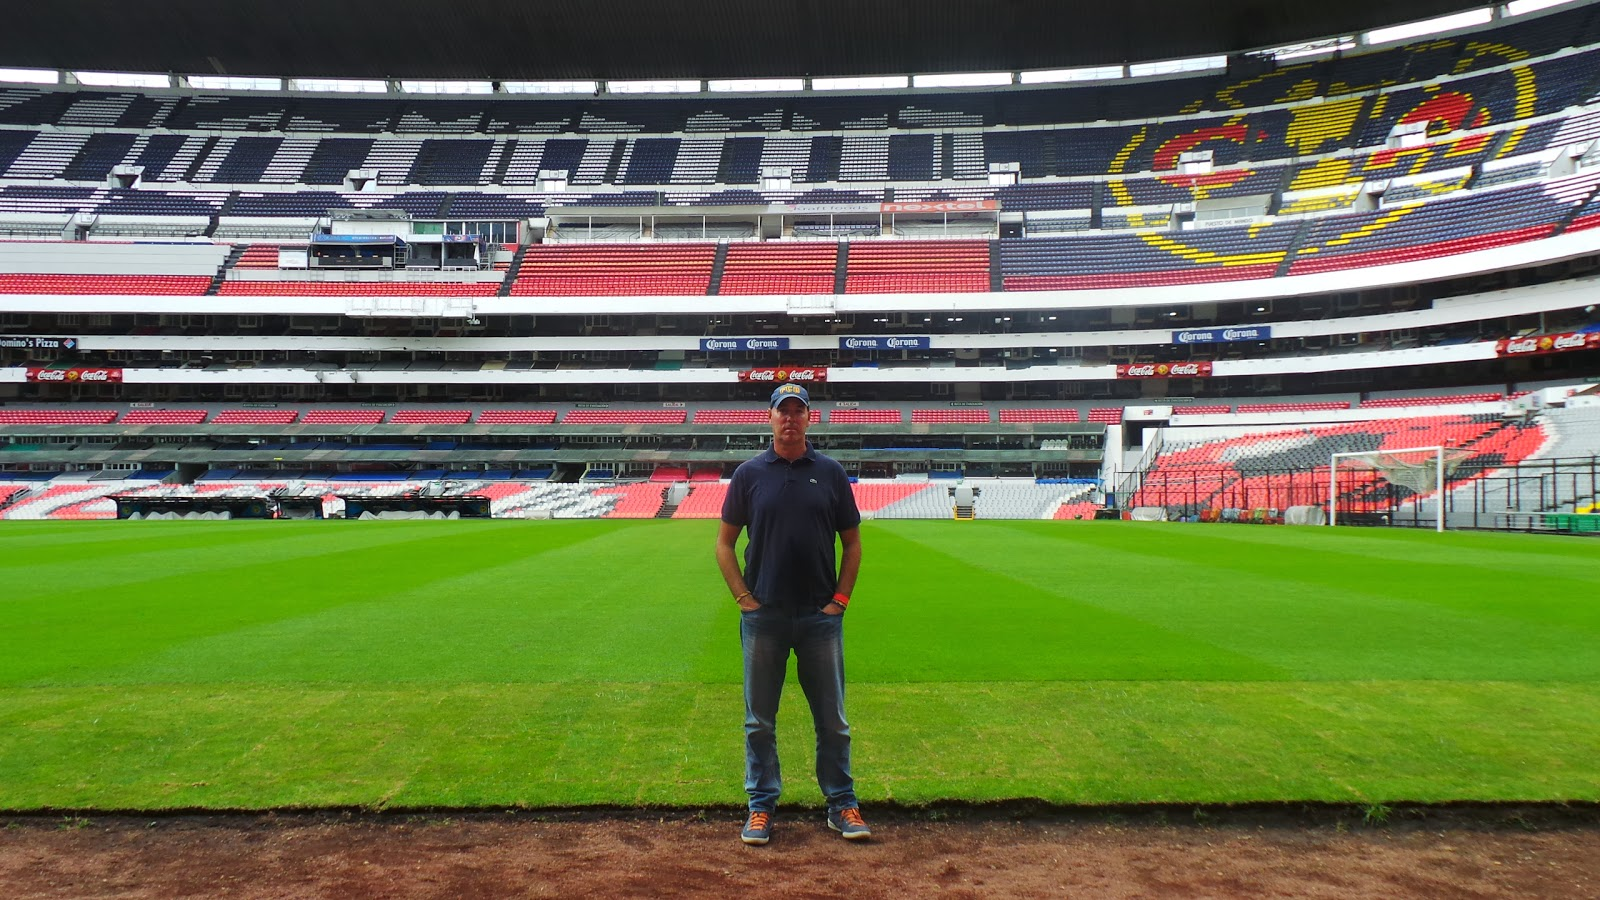 Lucalovesfootball estadio azteca for Puerta 1 estadio azteca